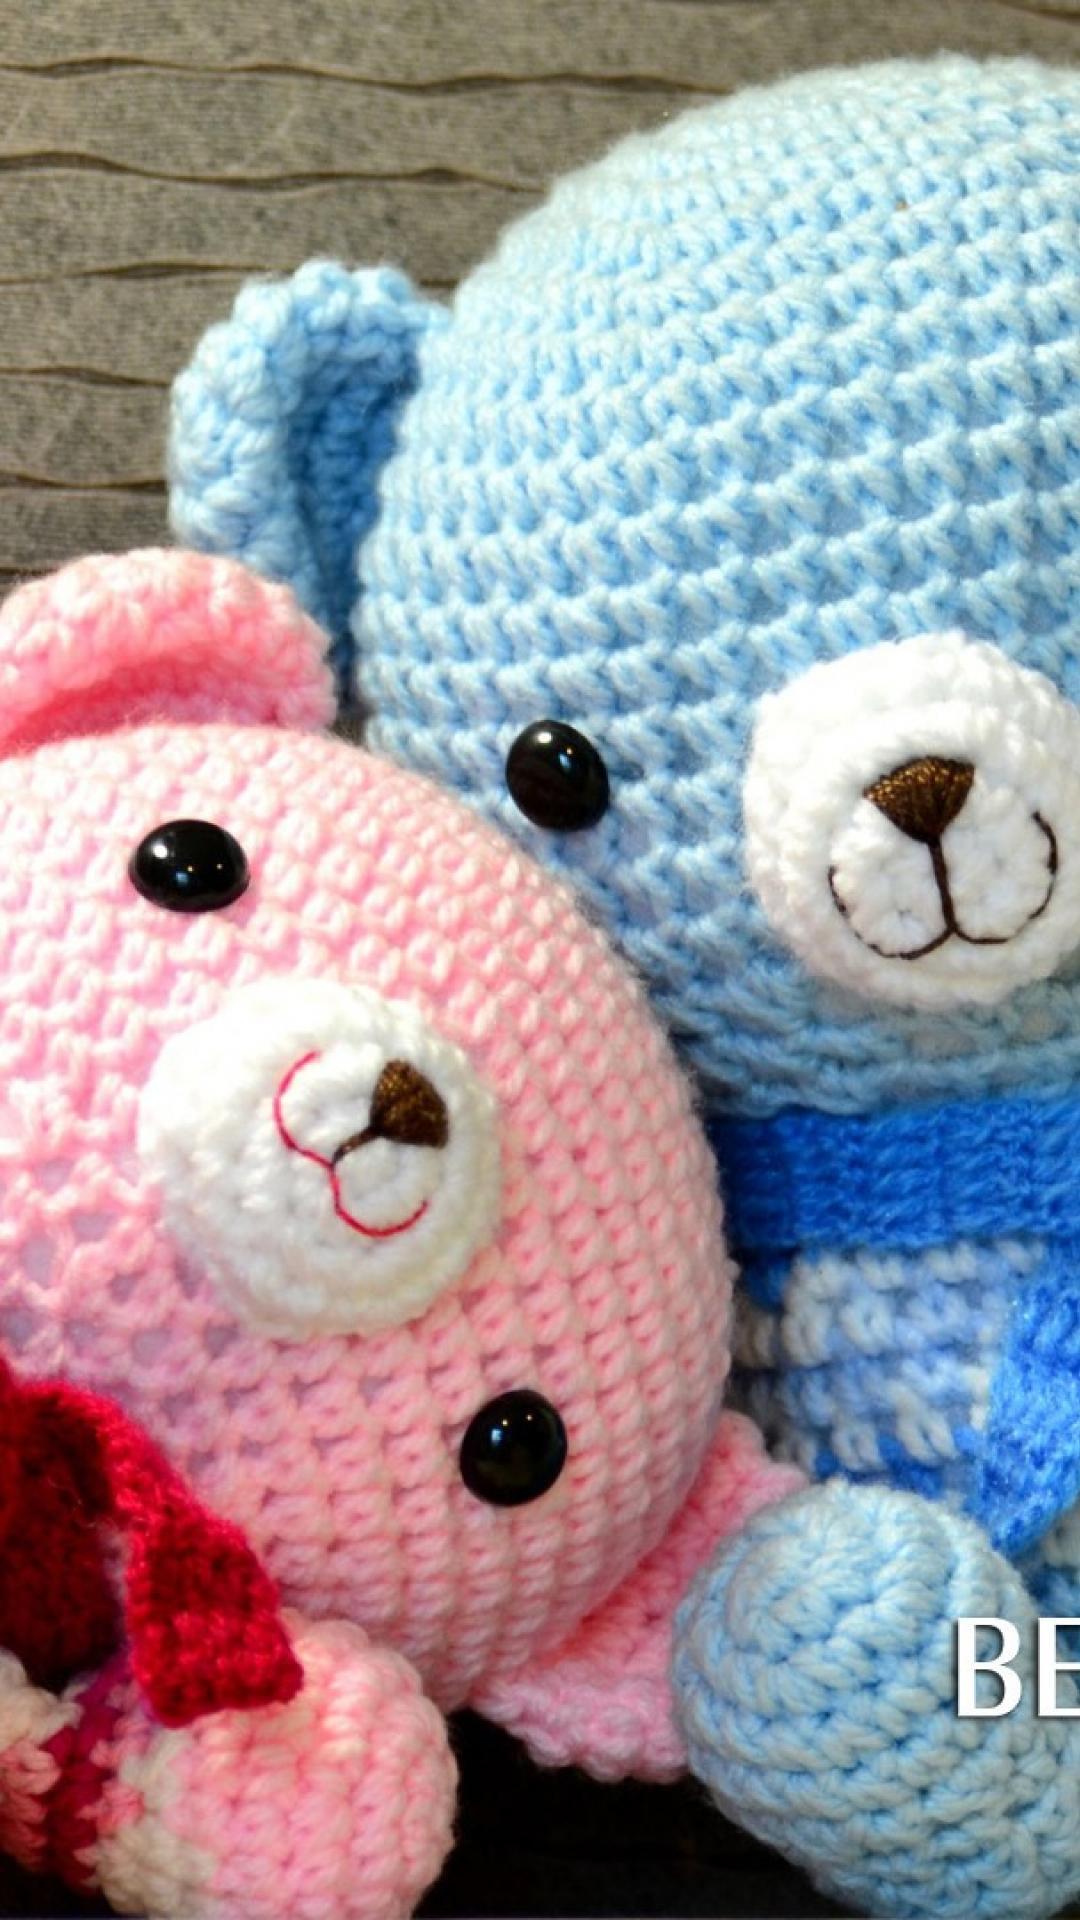 Download Wallpaper Cute Couple Teddy Bear Hd Backgrounds